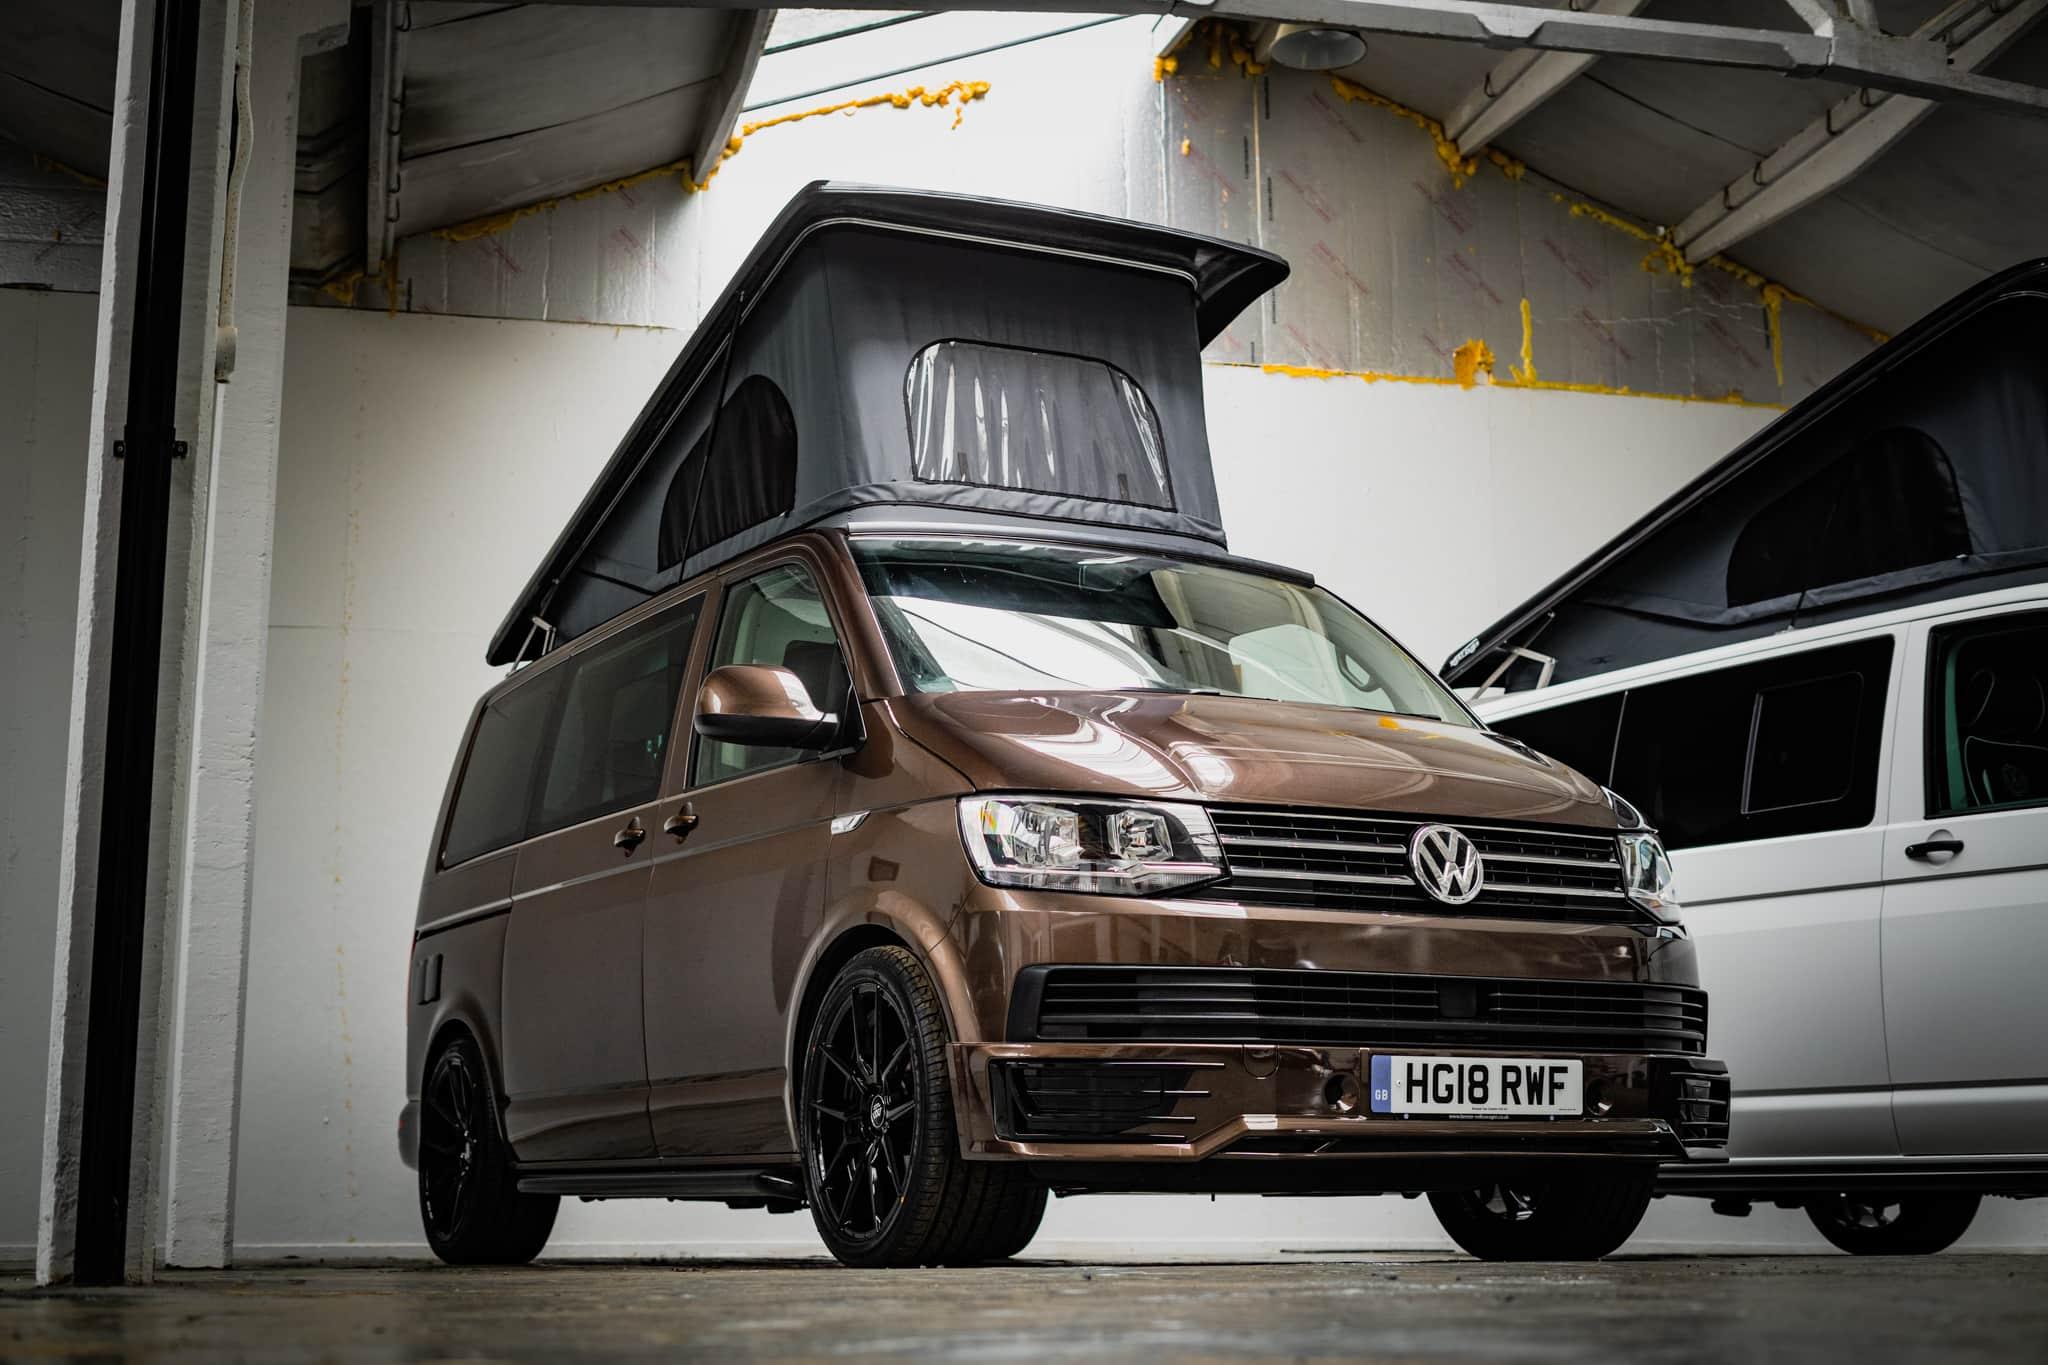 VW T6 Toffee Brown - DSG - Poptop Roof - 23rd Aug